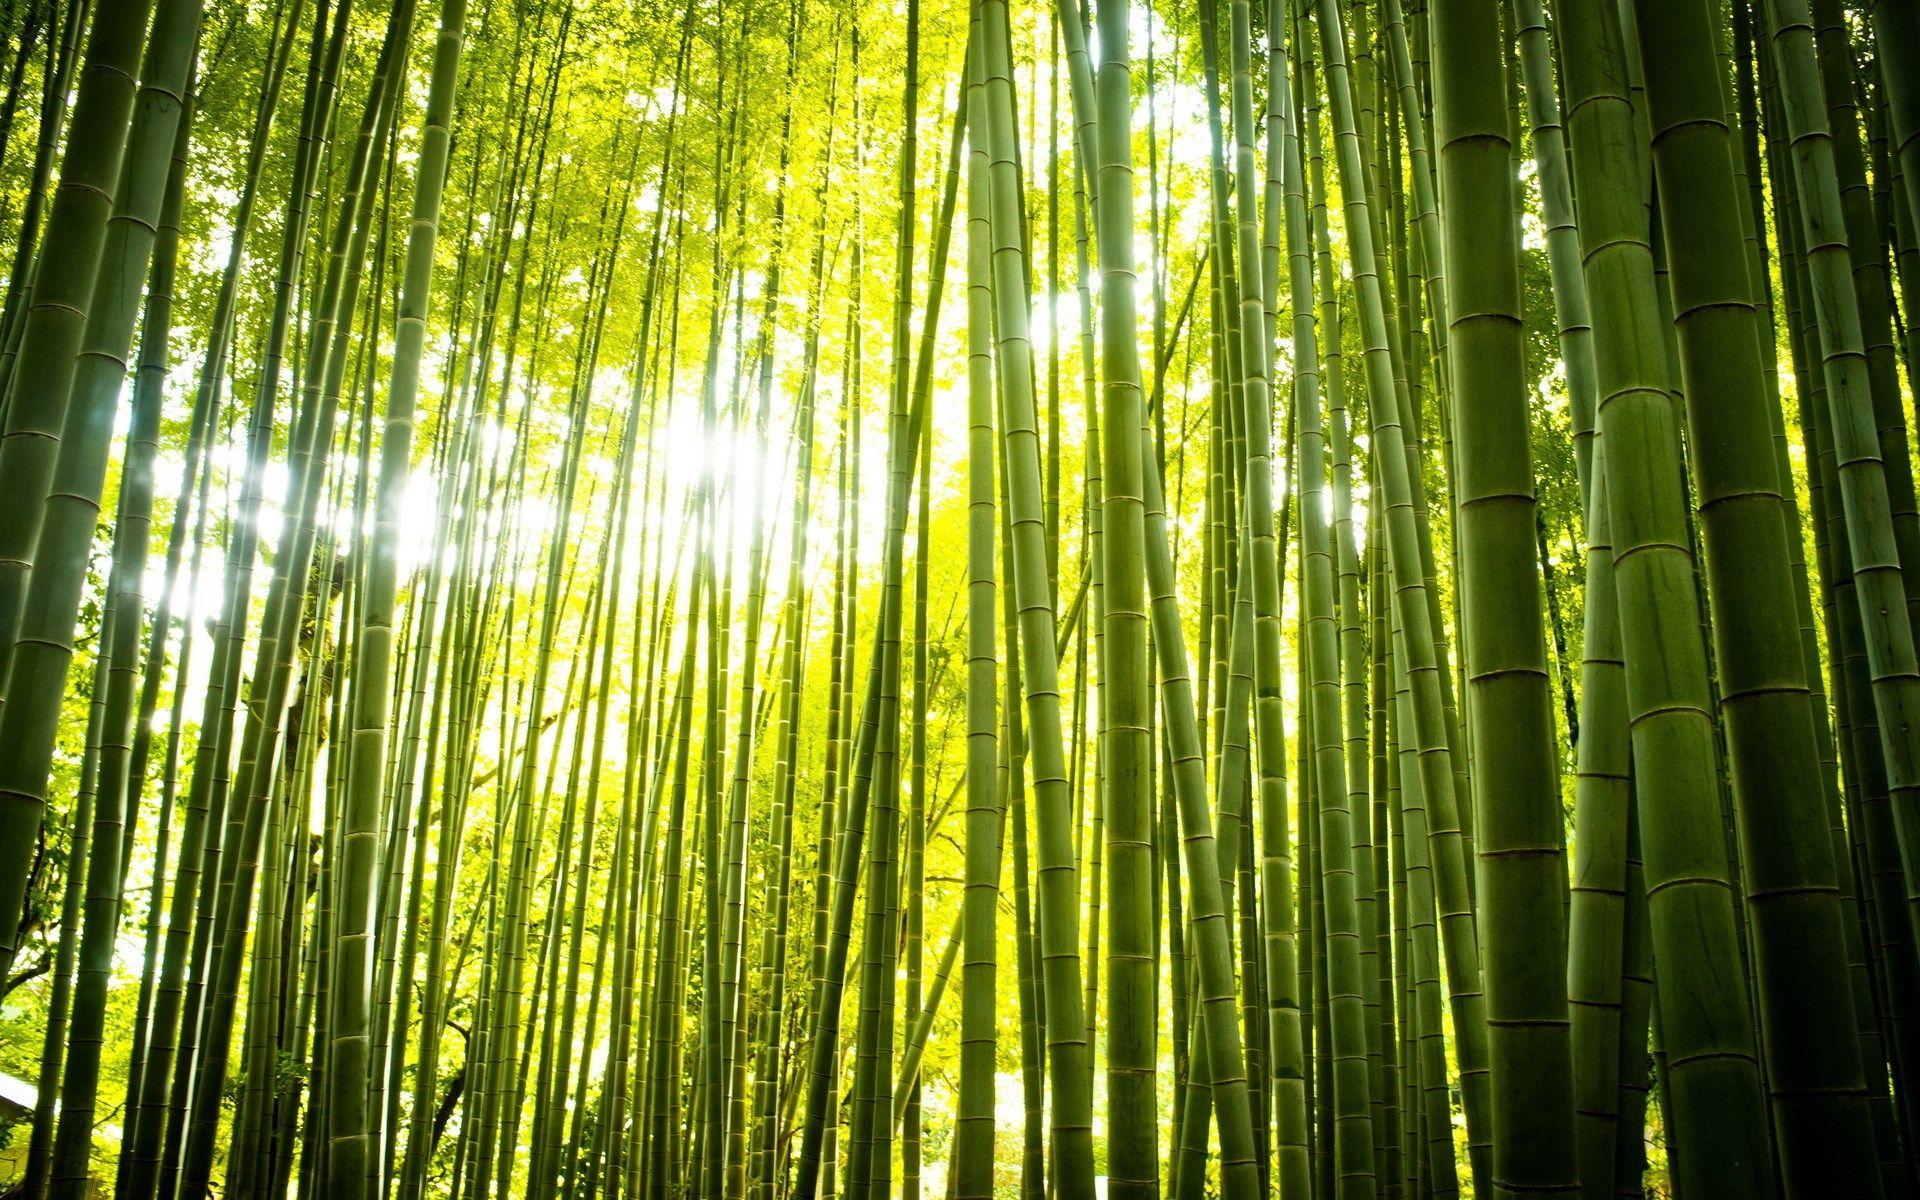 Free Desktop Bamboo Backgrounds